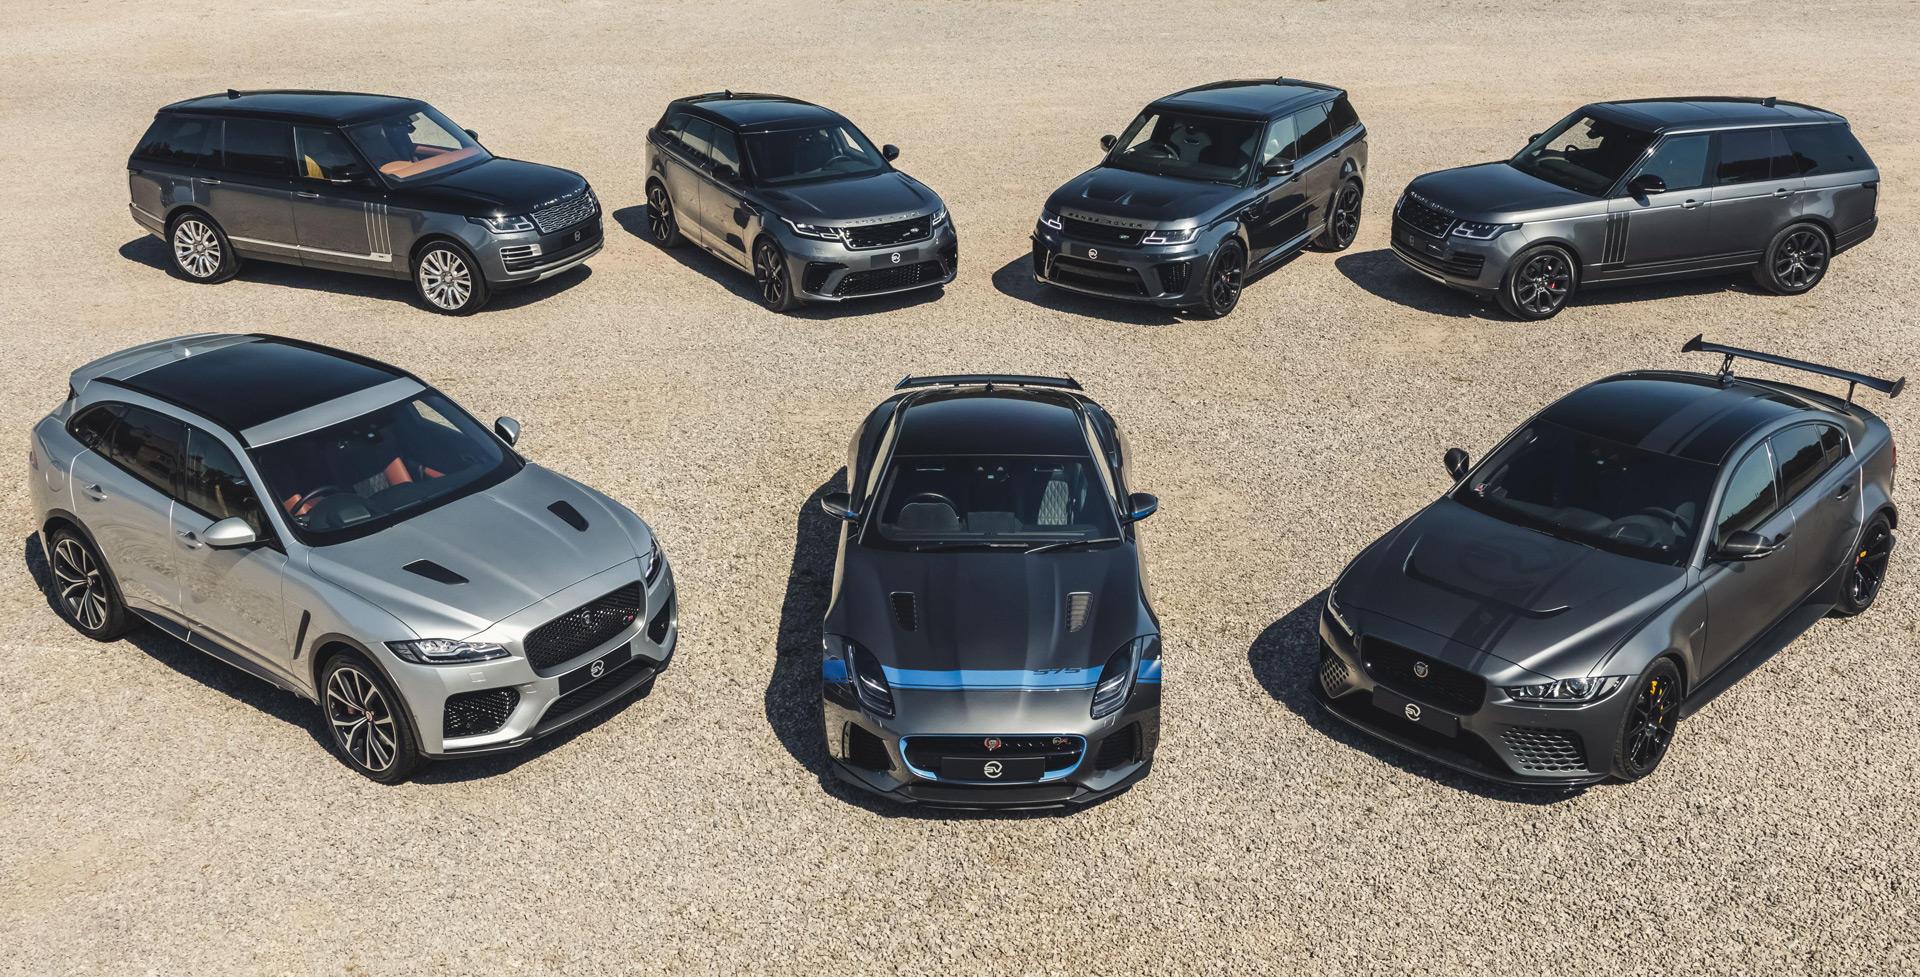 Jaguar Land Rover's SVO plans high-performance EVs